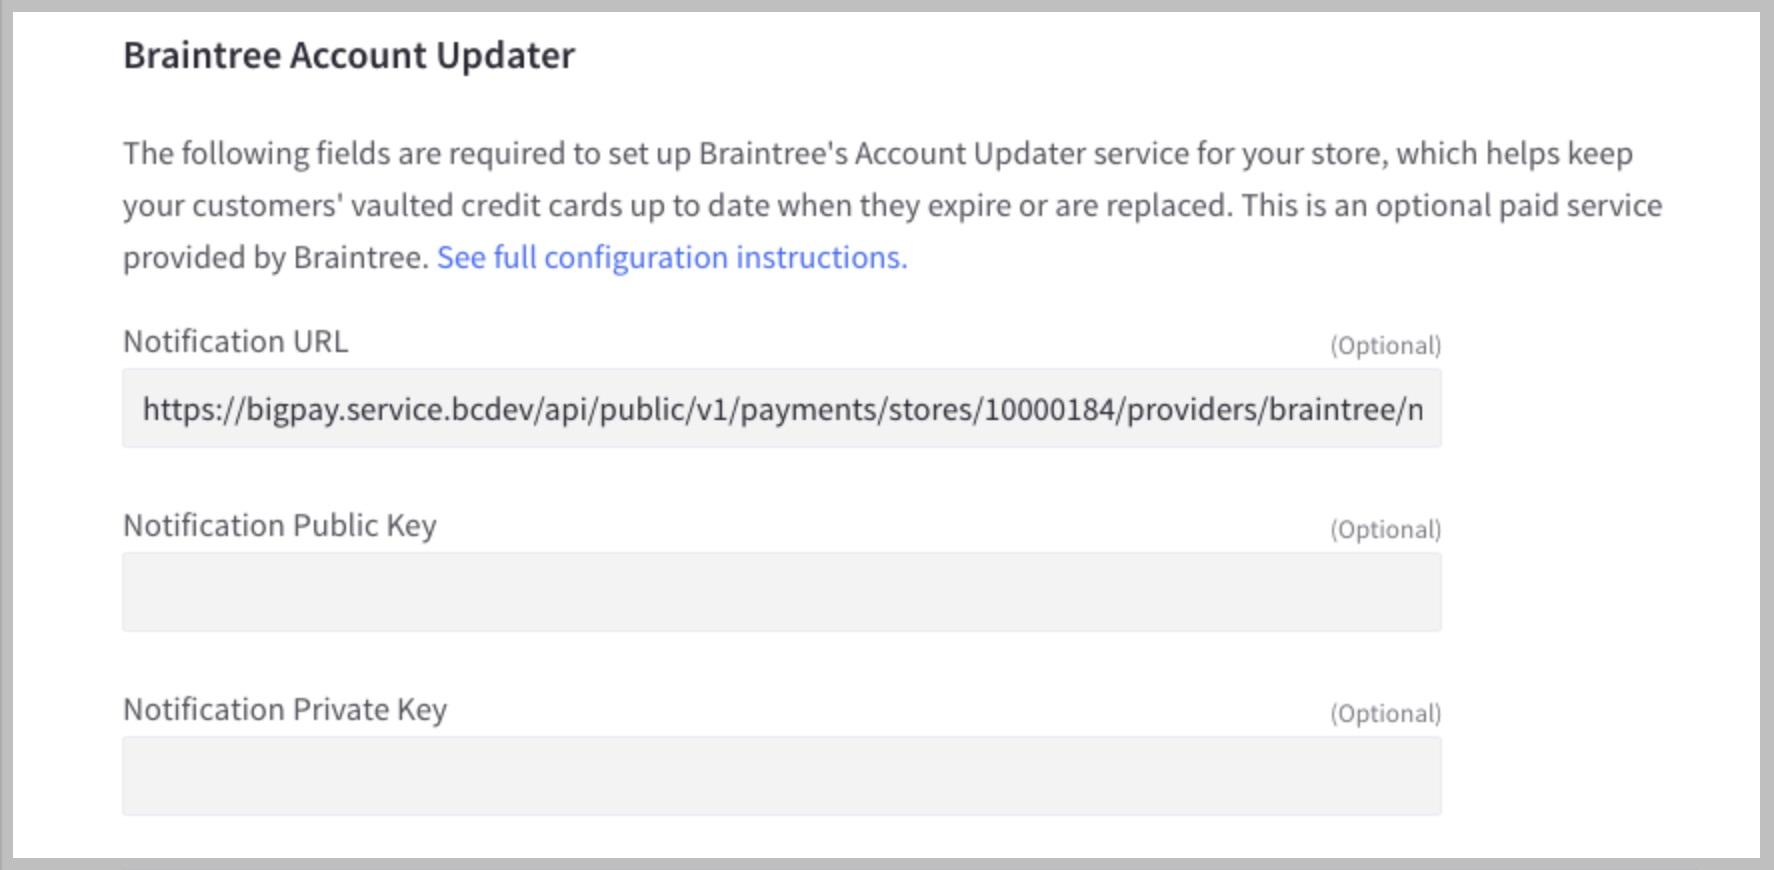 Braintree Account Updater